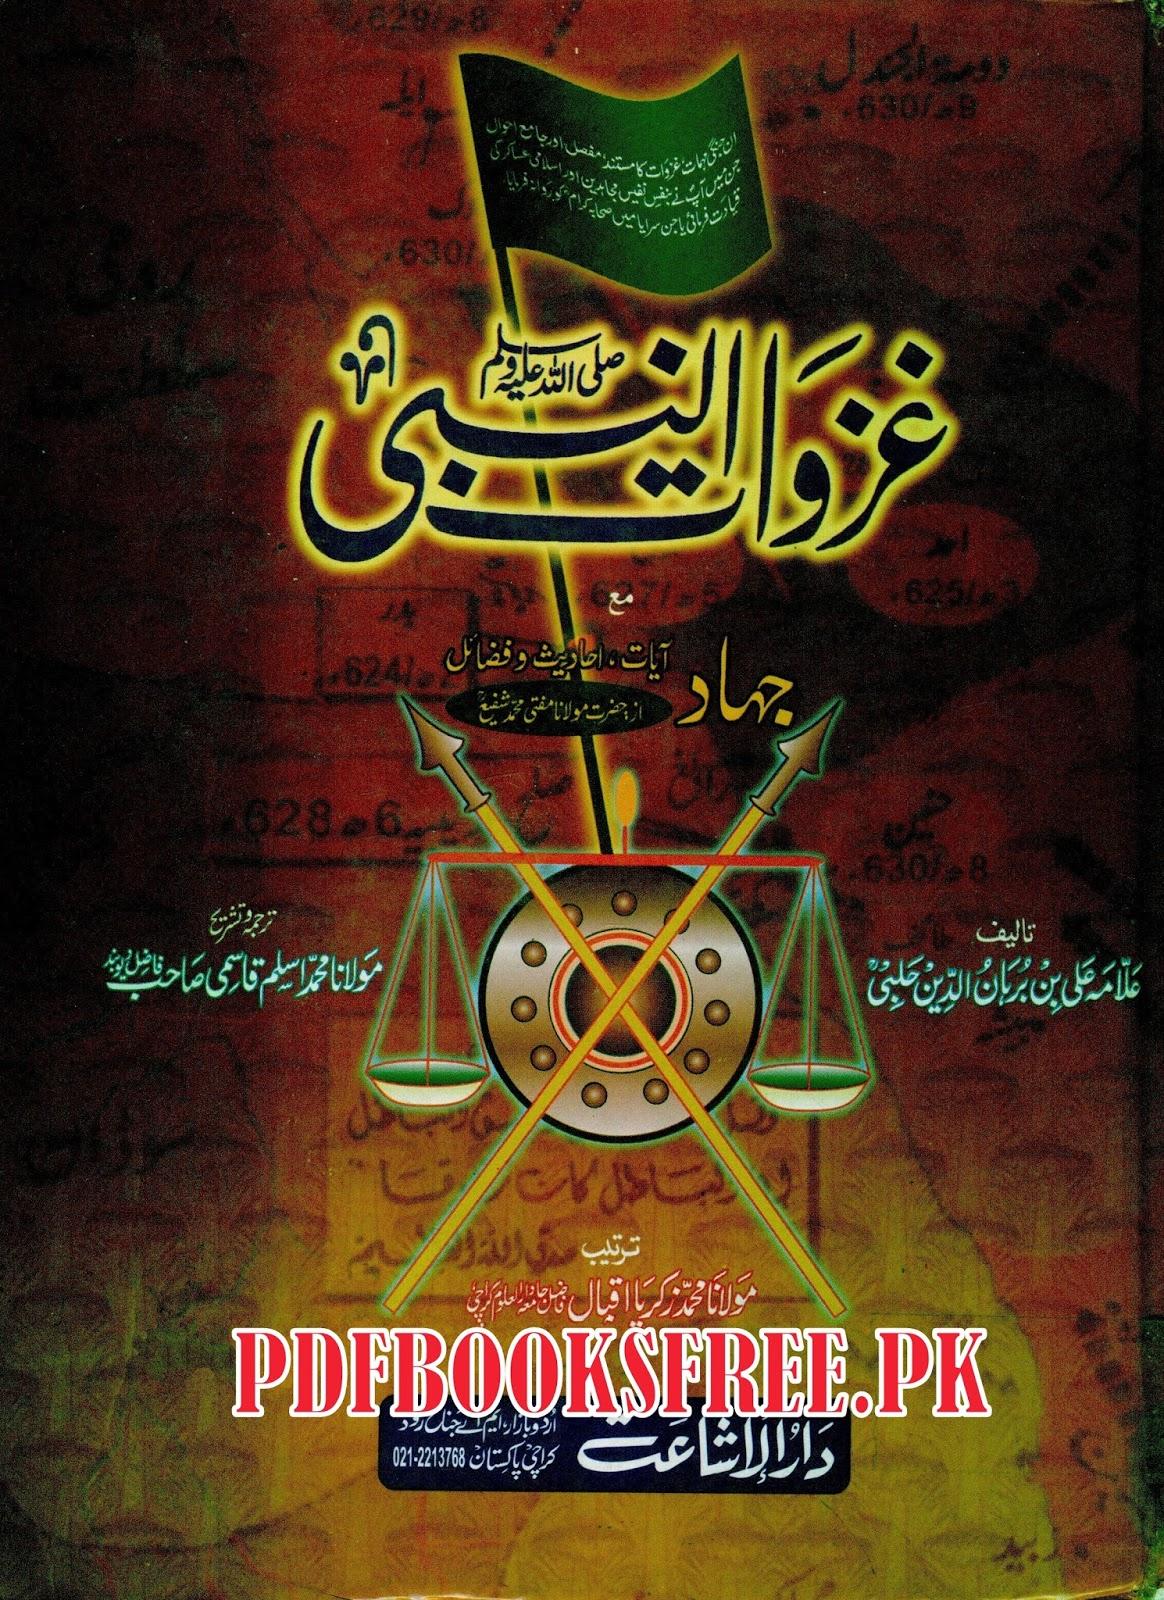 Ghazwatun Nabi S.A.W in Urdu